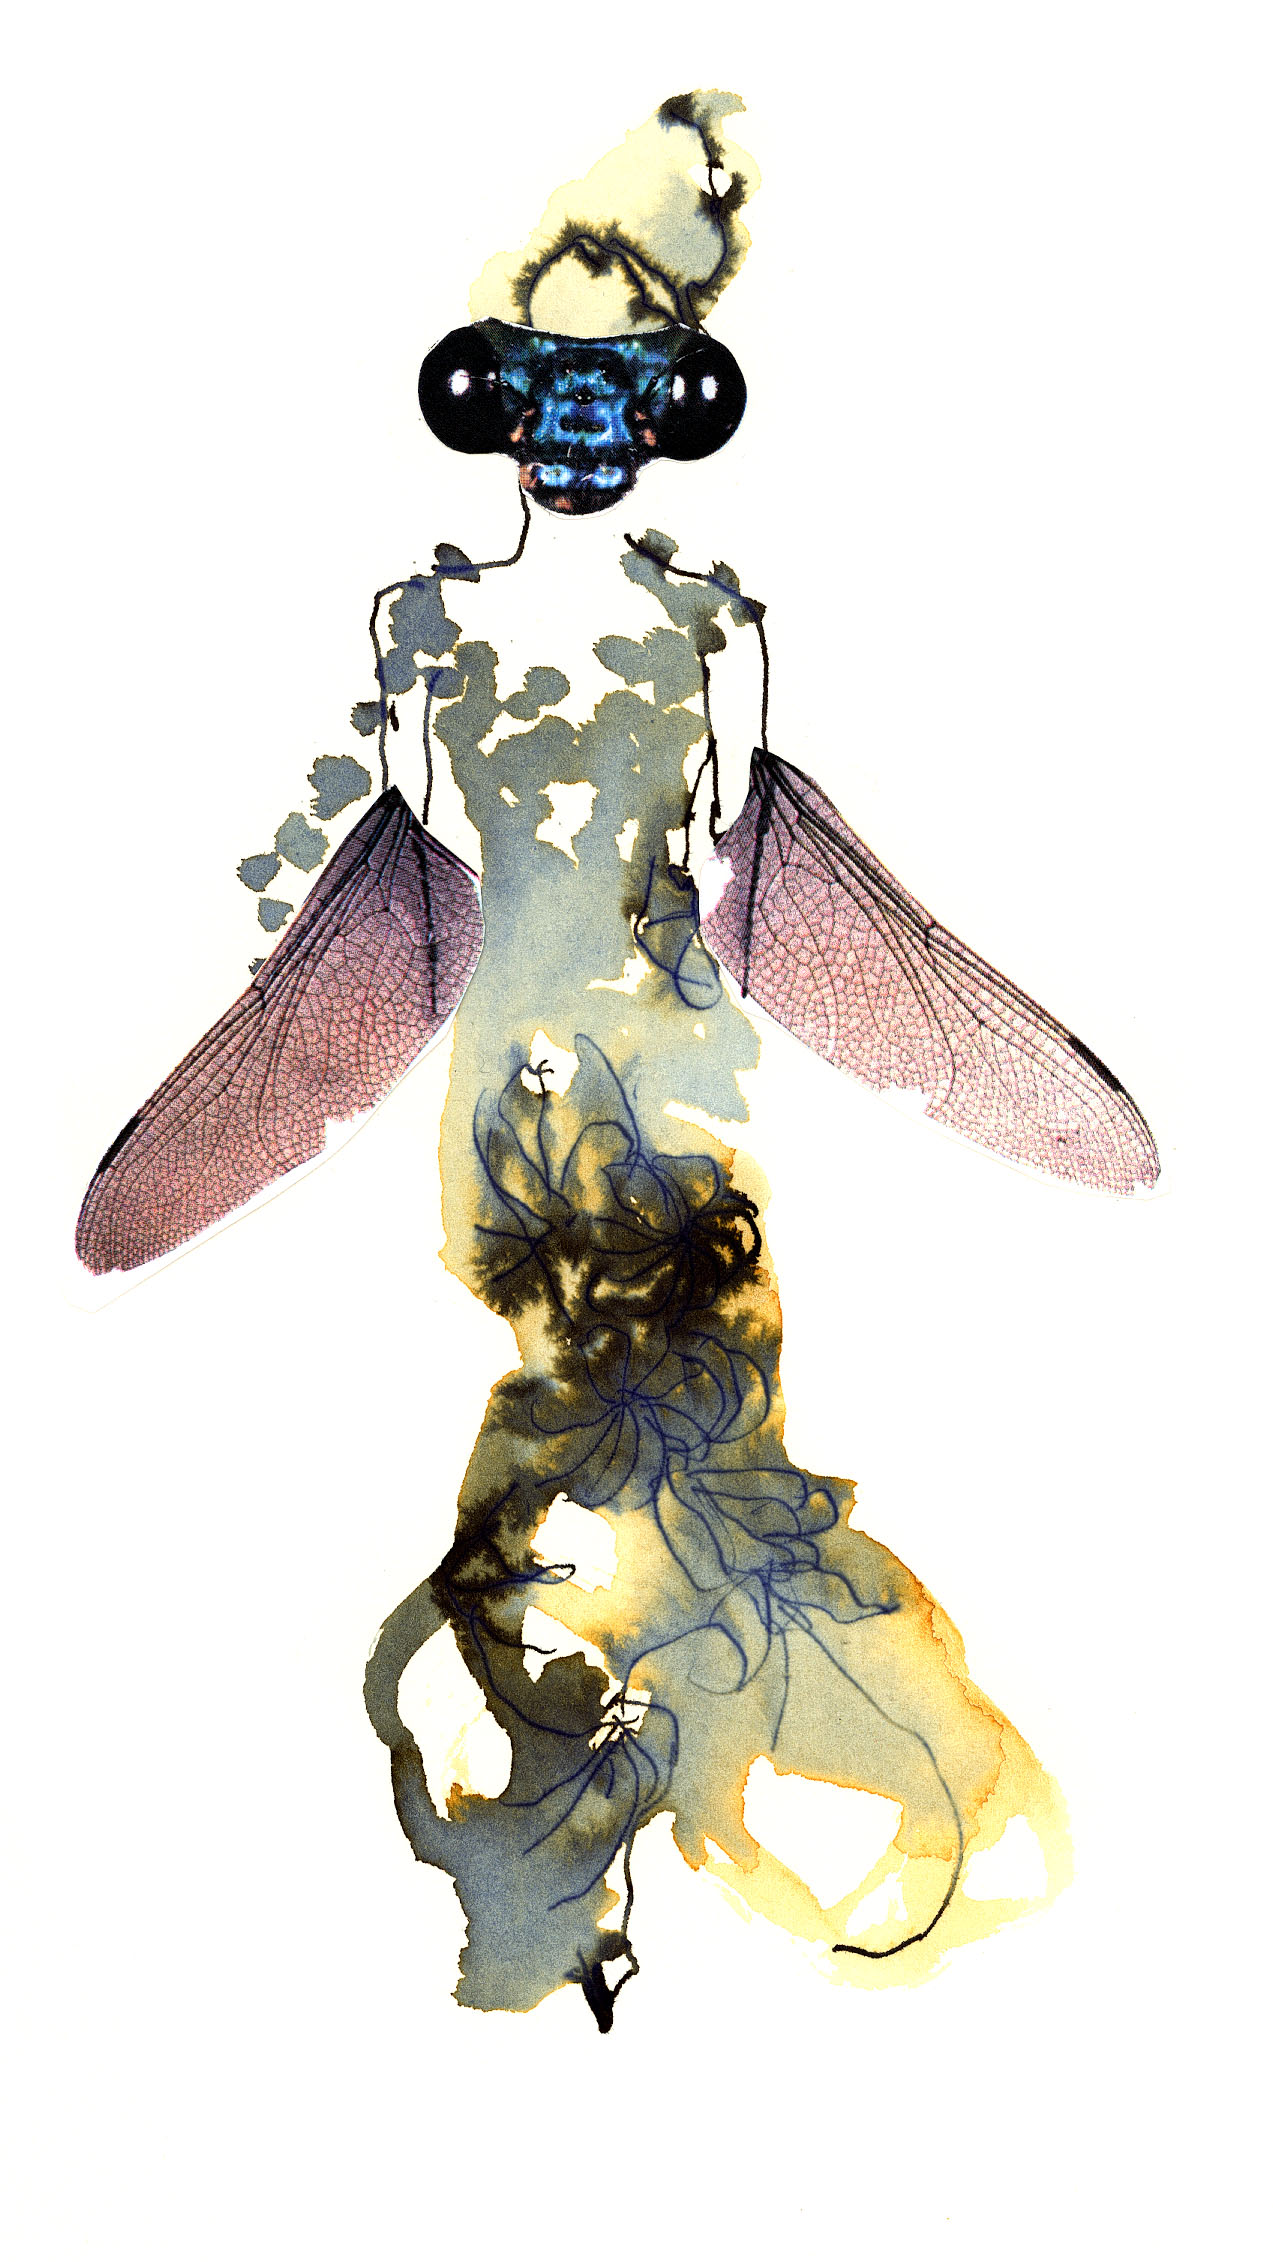 insektsmode2.jpg